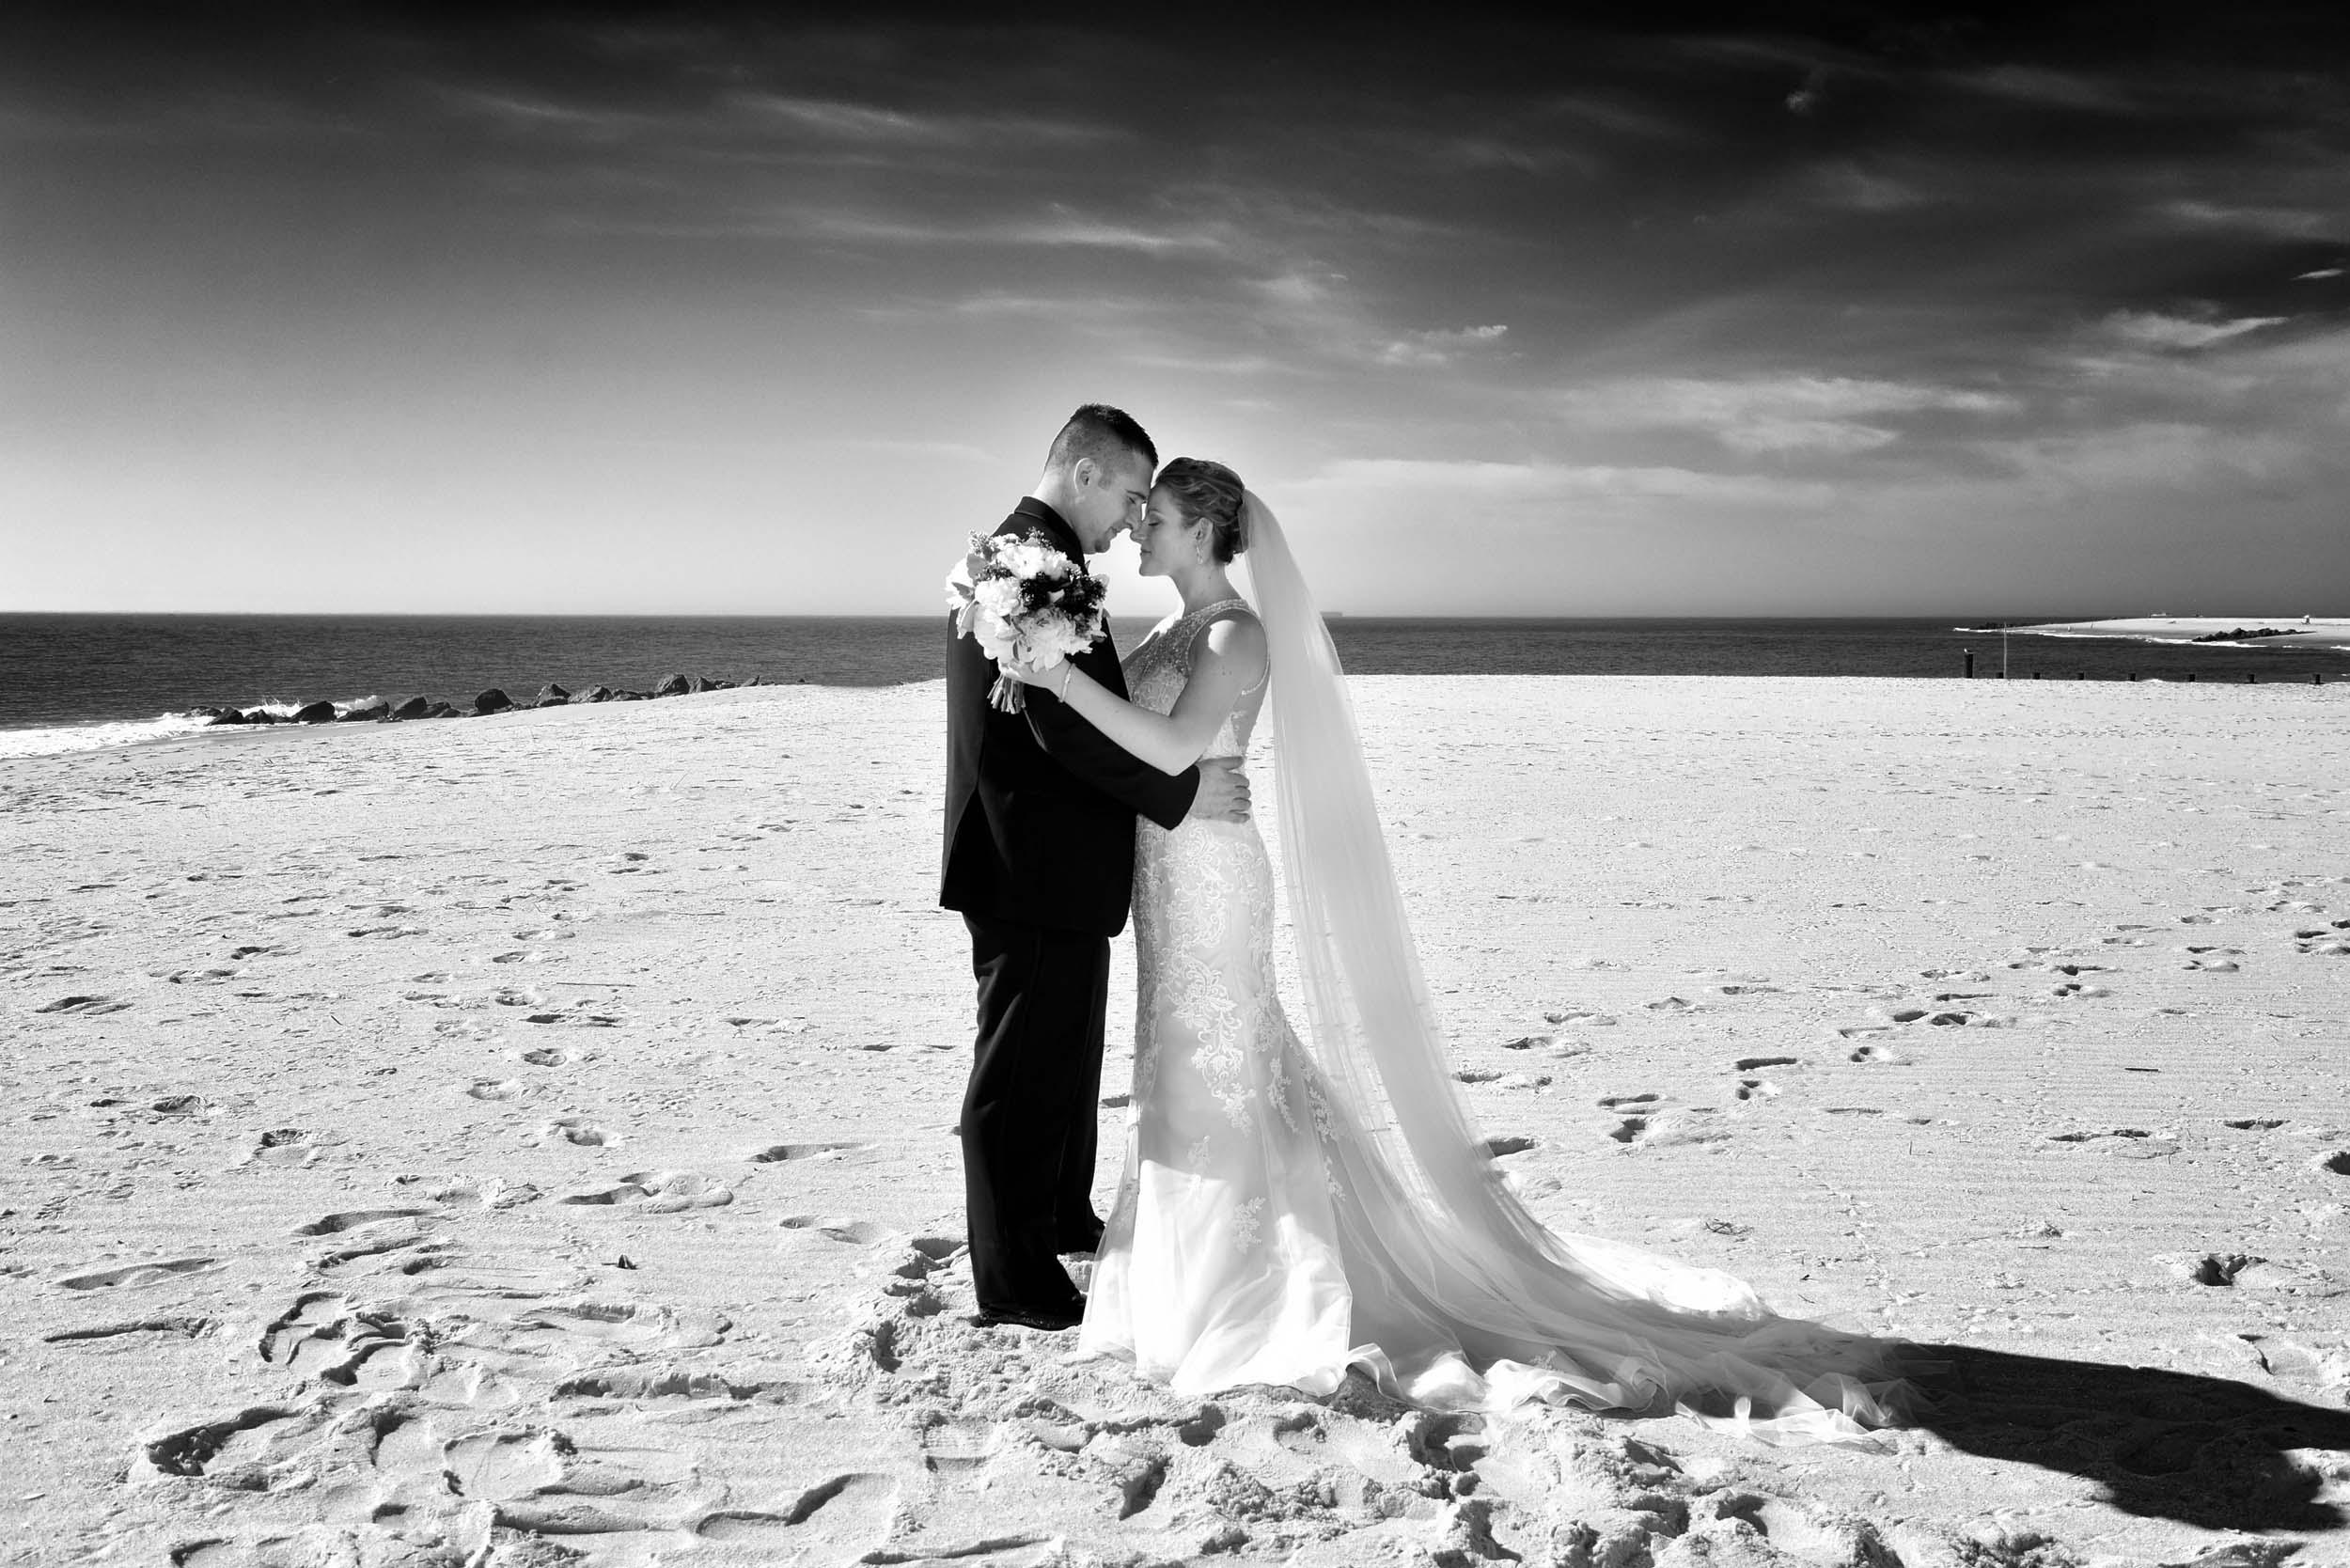 Dramatic bride and groom on beach